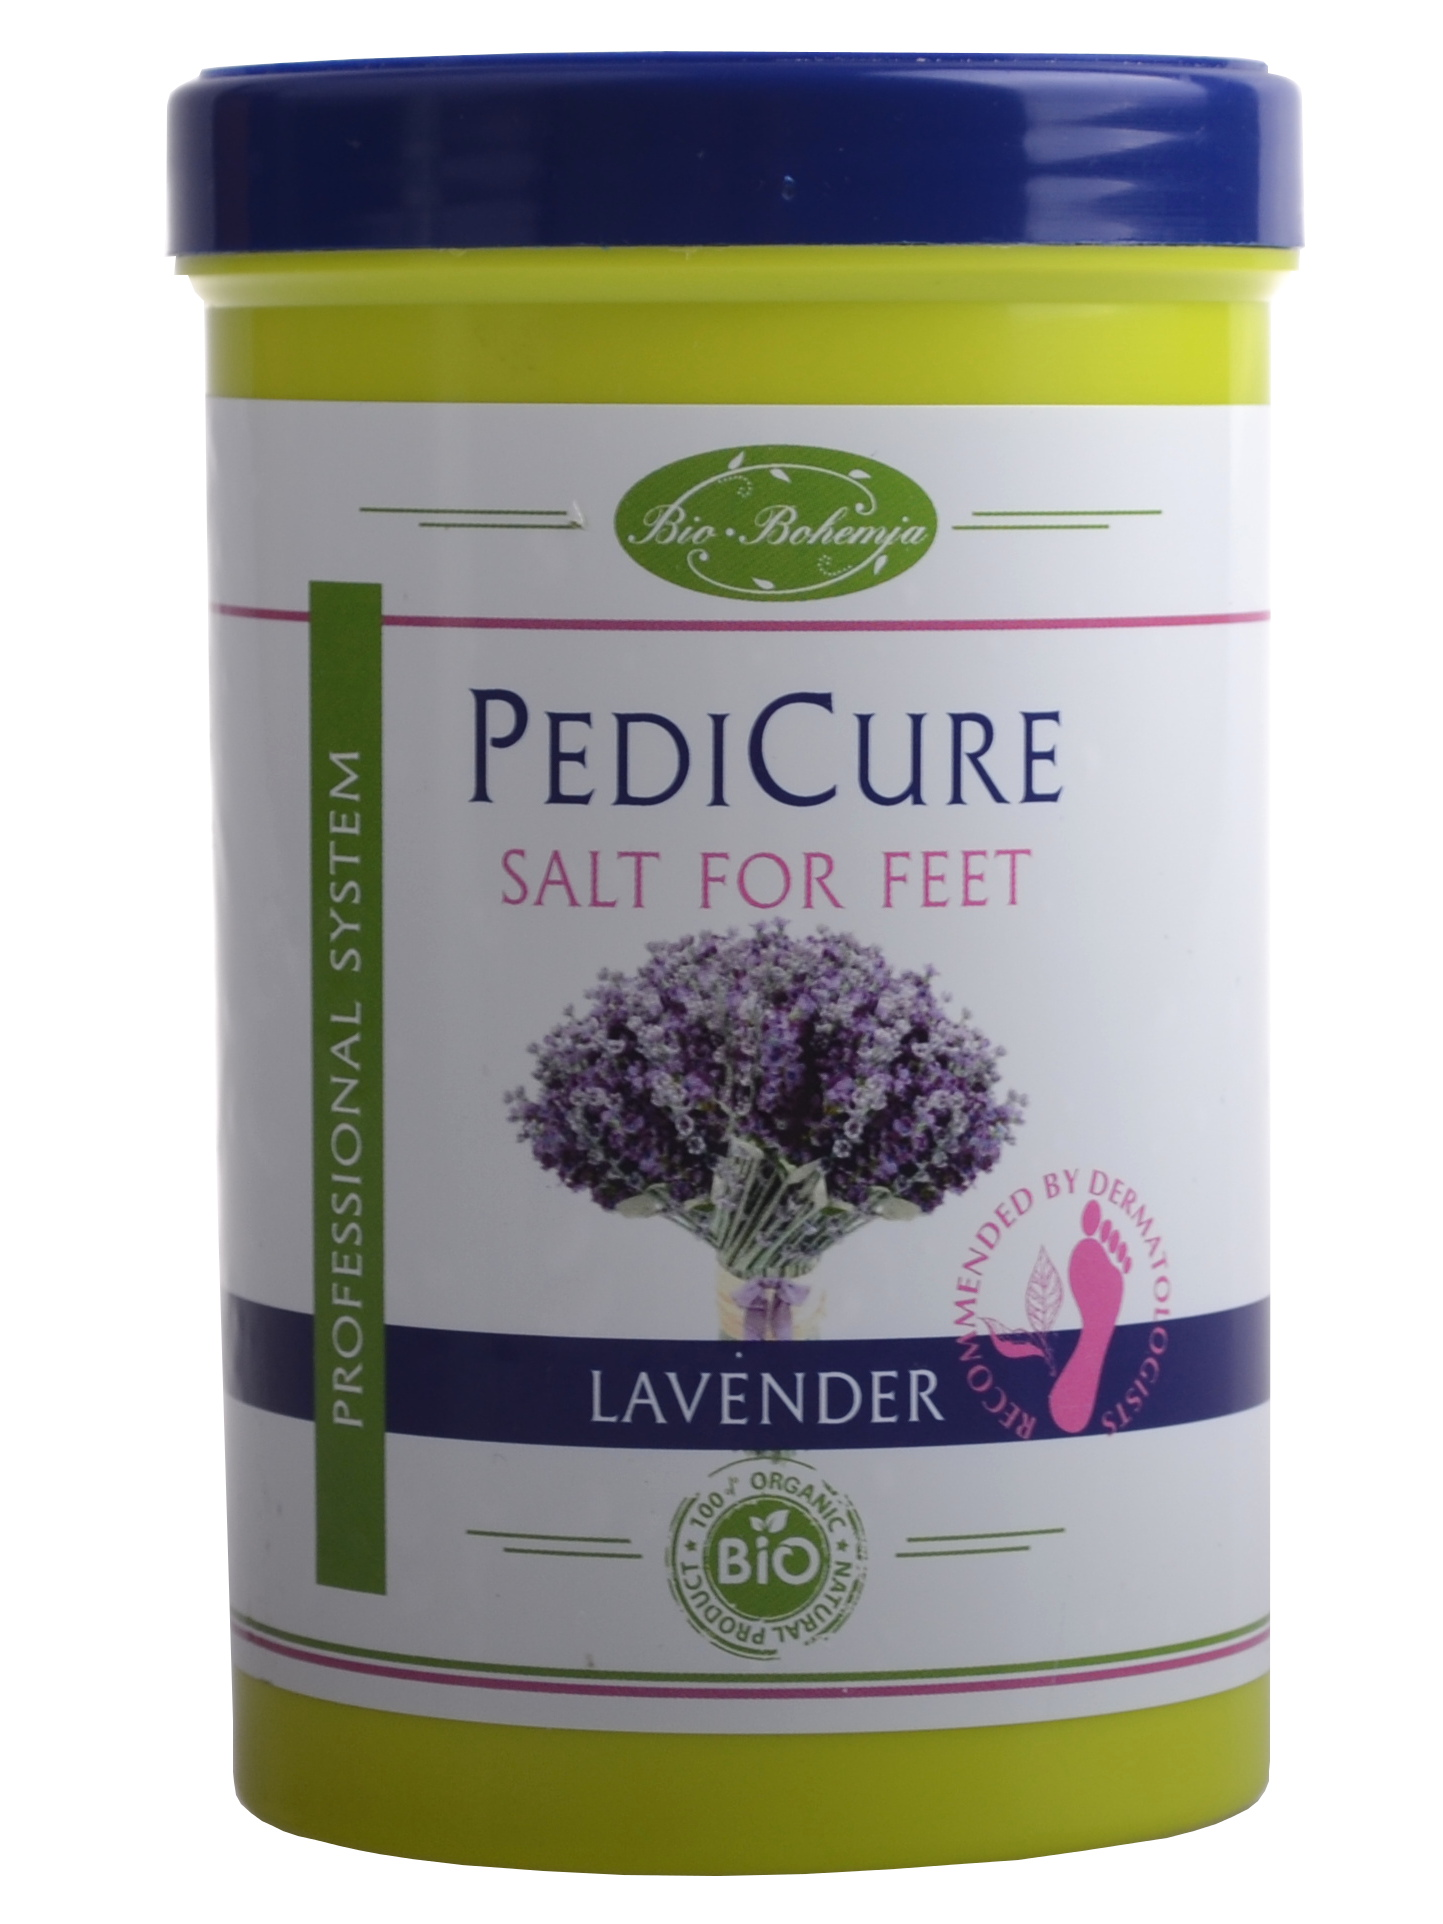 Koupelová sůl na nohy s levandulovým olejem Bio Bohemia Lavender - 420 ml (950600)